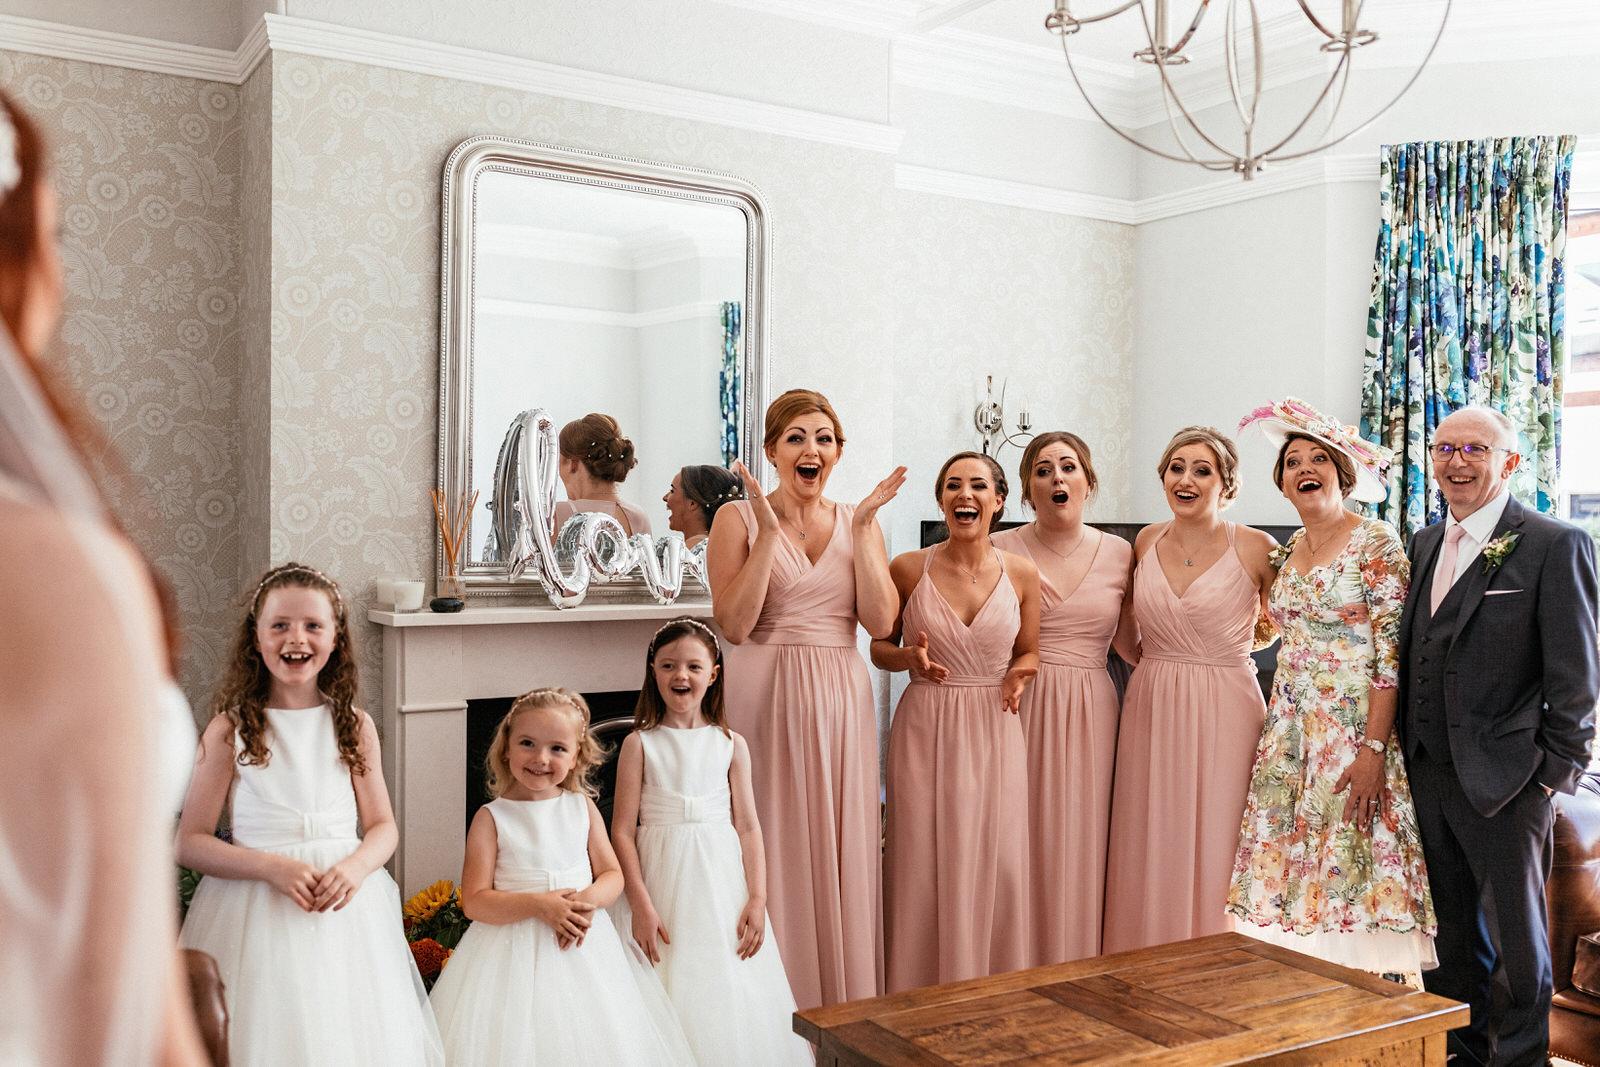 Beamish-Hall-Wedding-Photographer-009.jpg